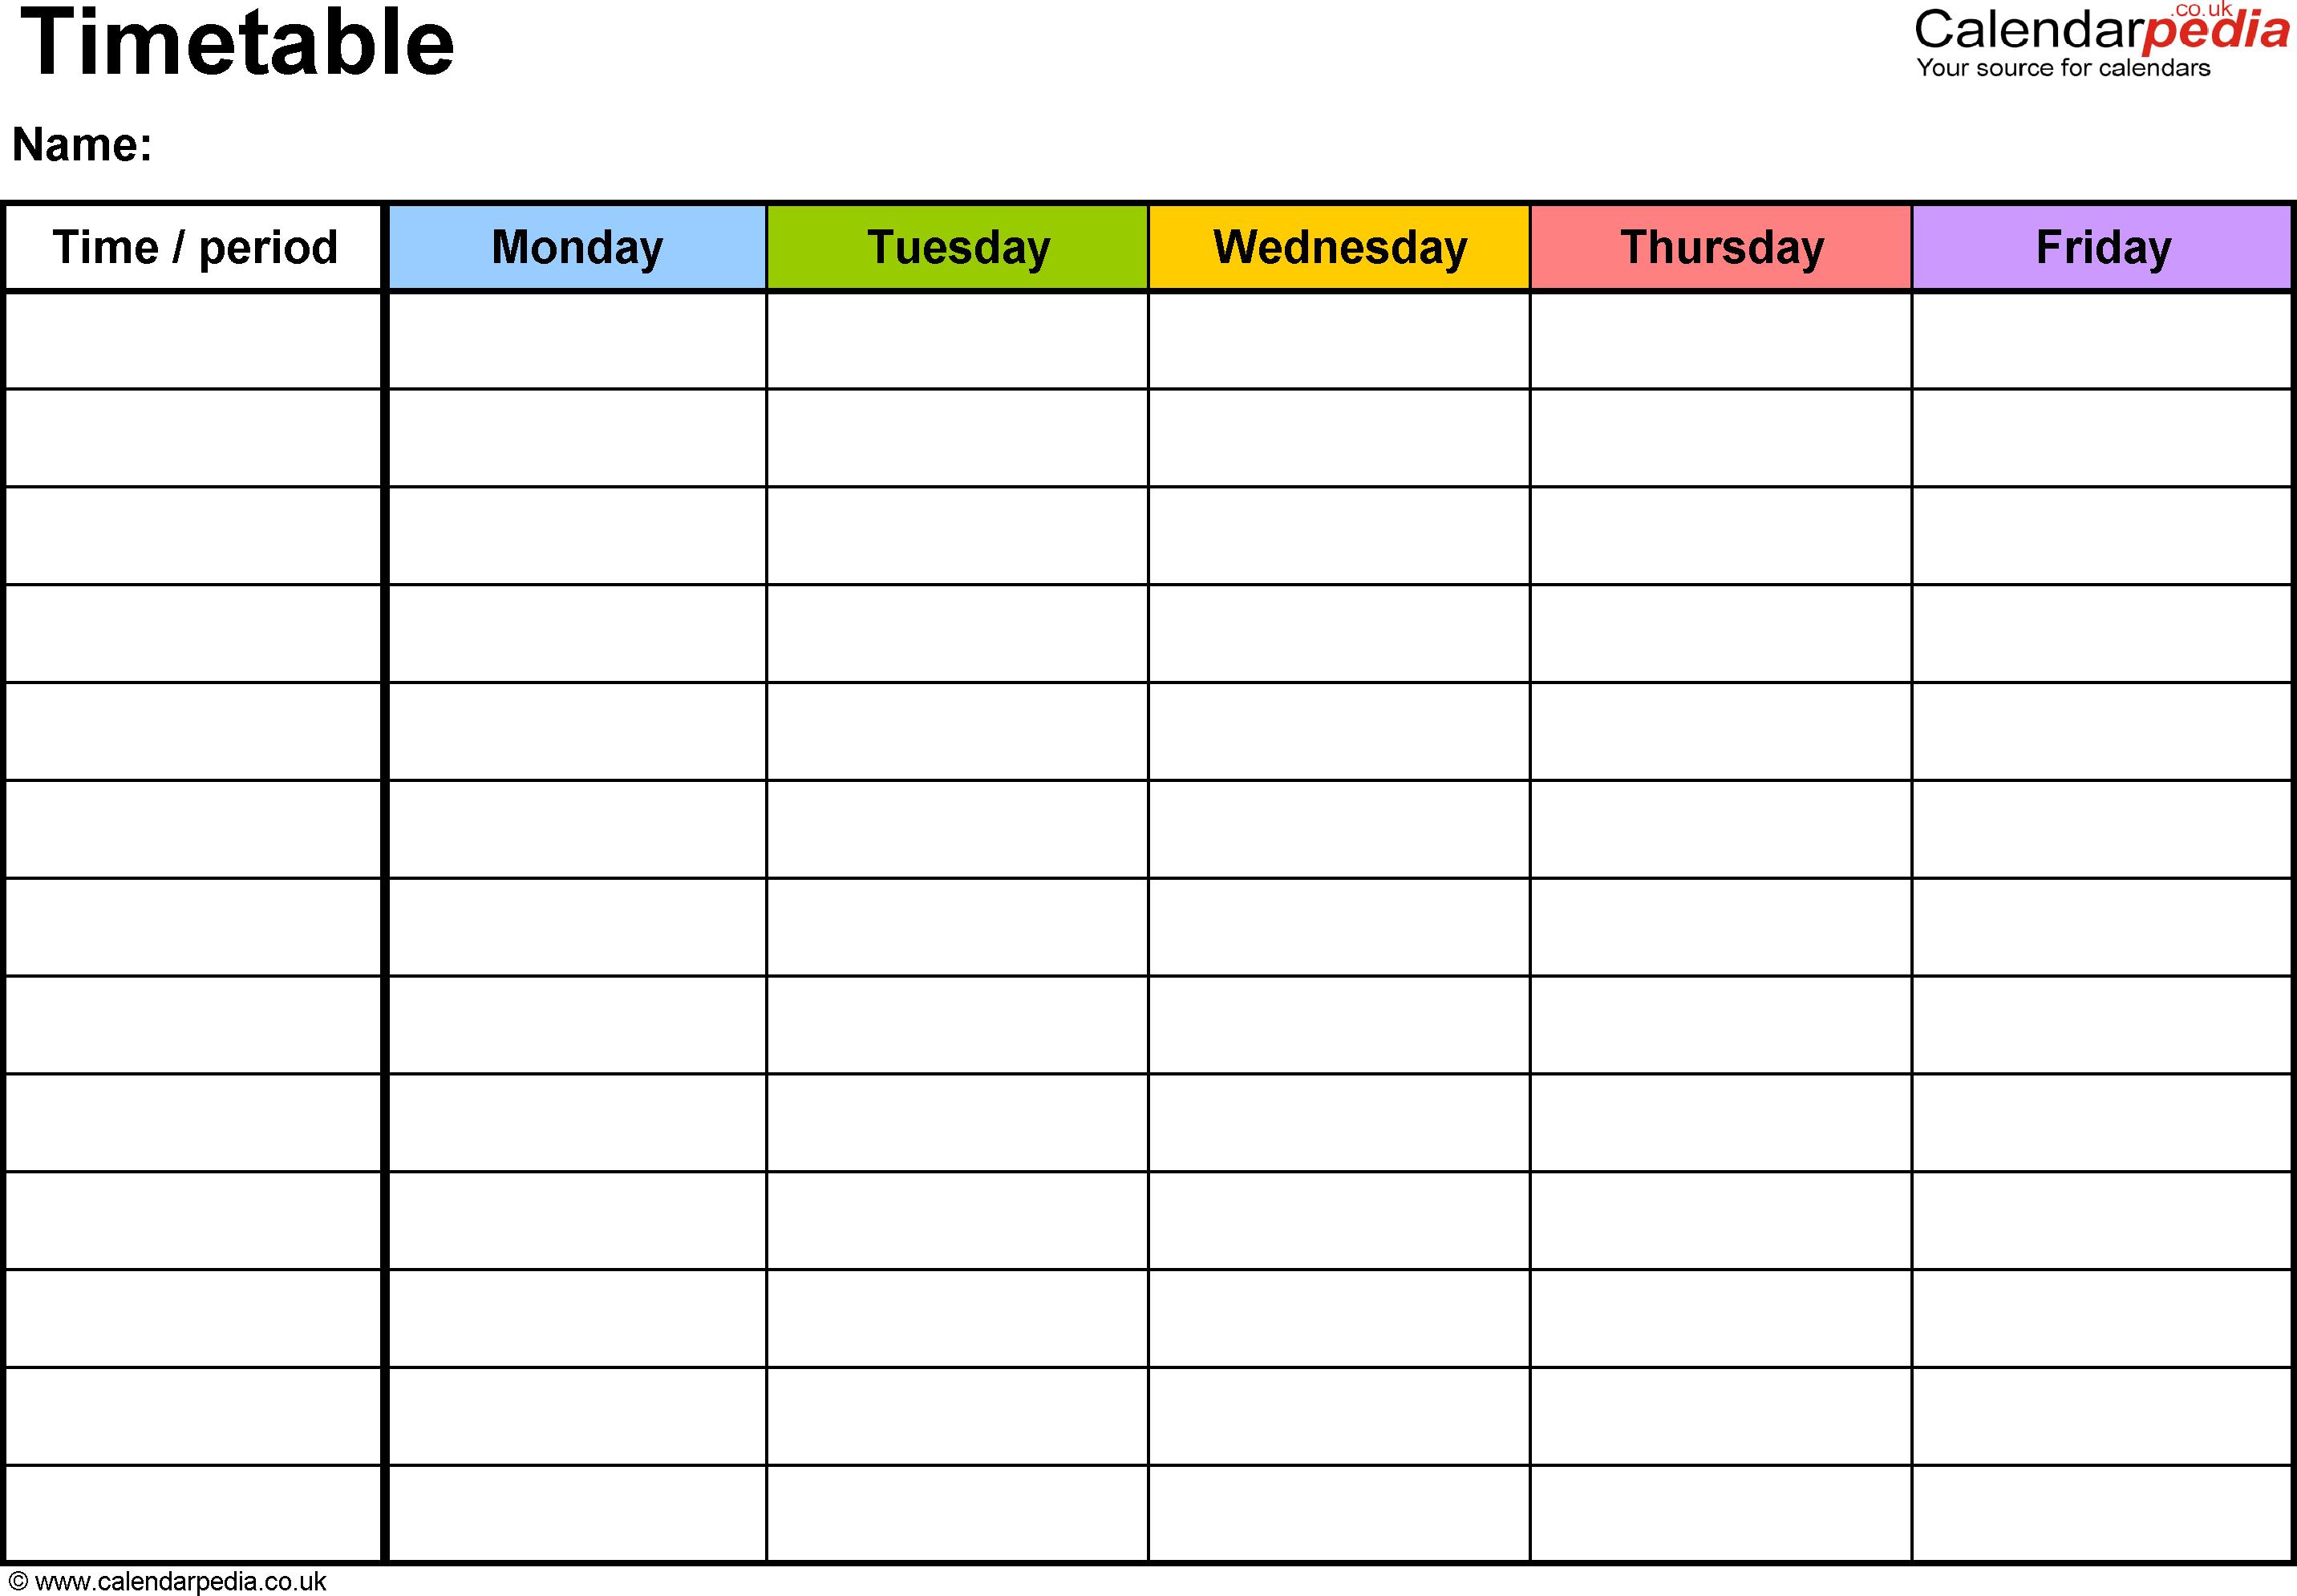 Excel Timetable Template 2: Landscape Format, A4, 1 Page